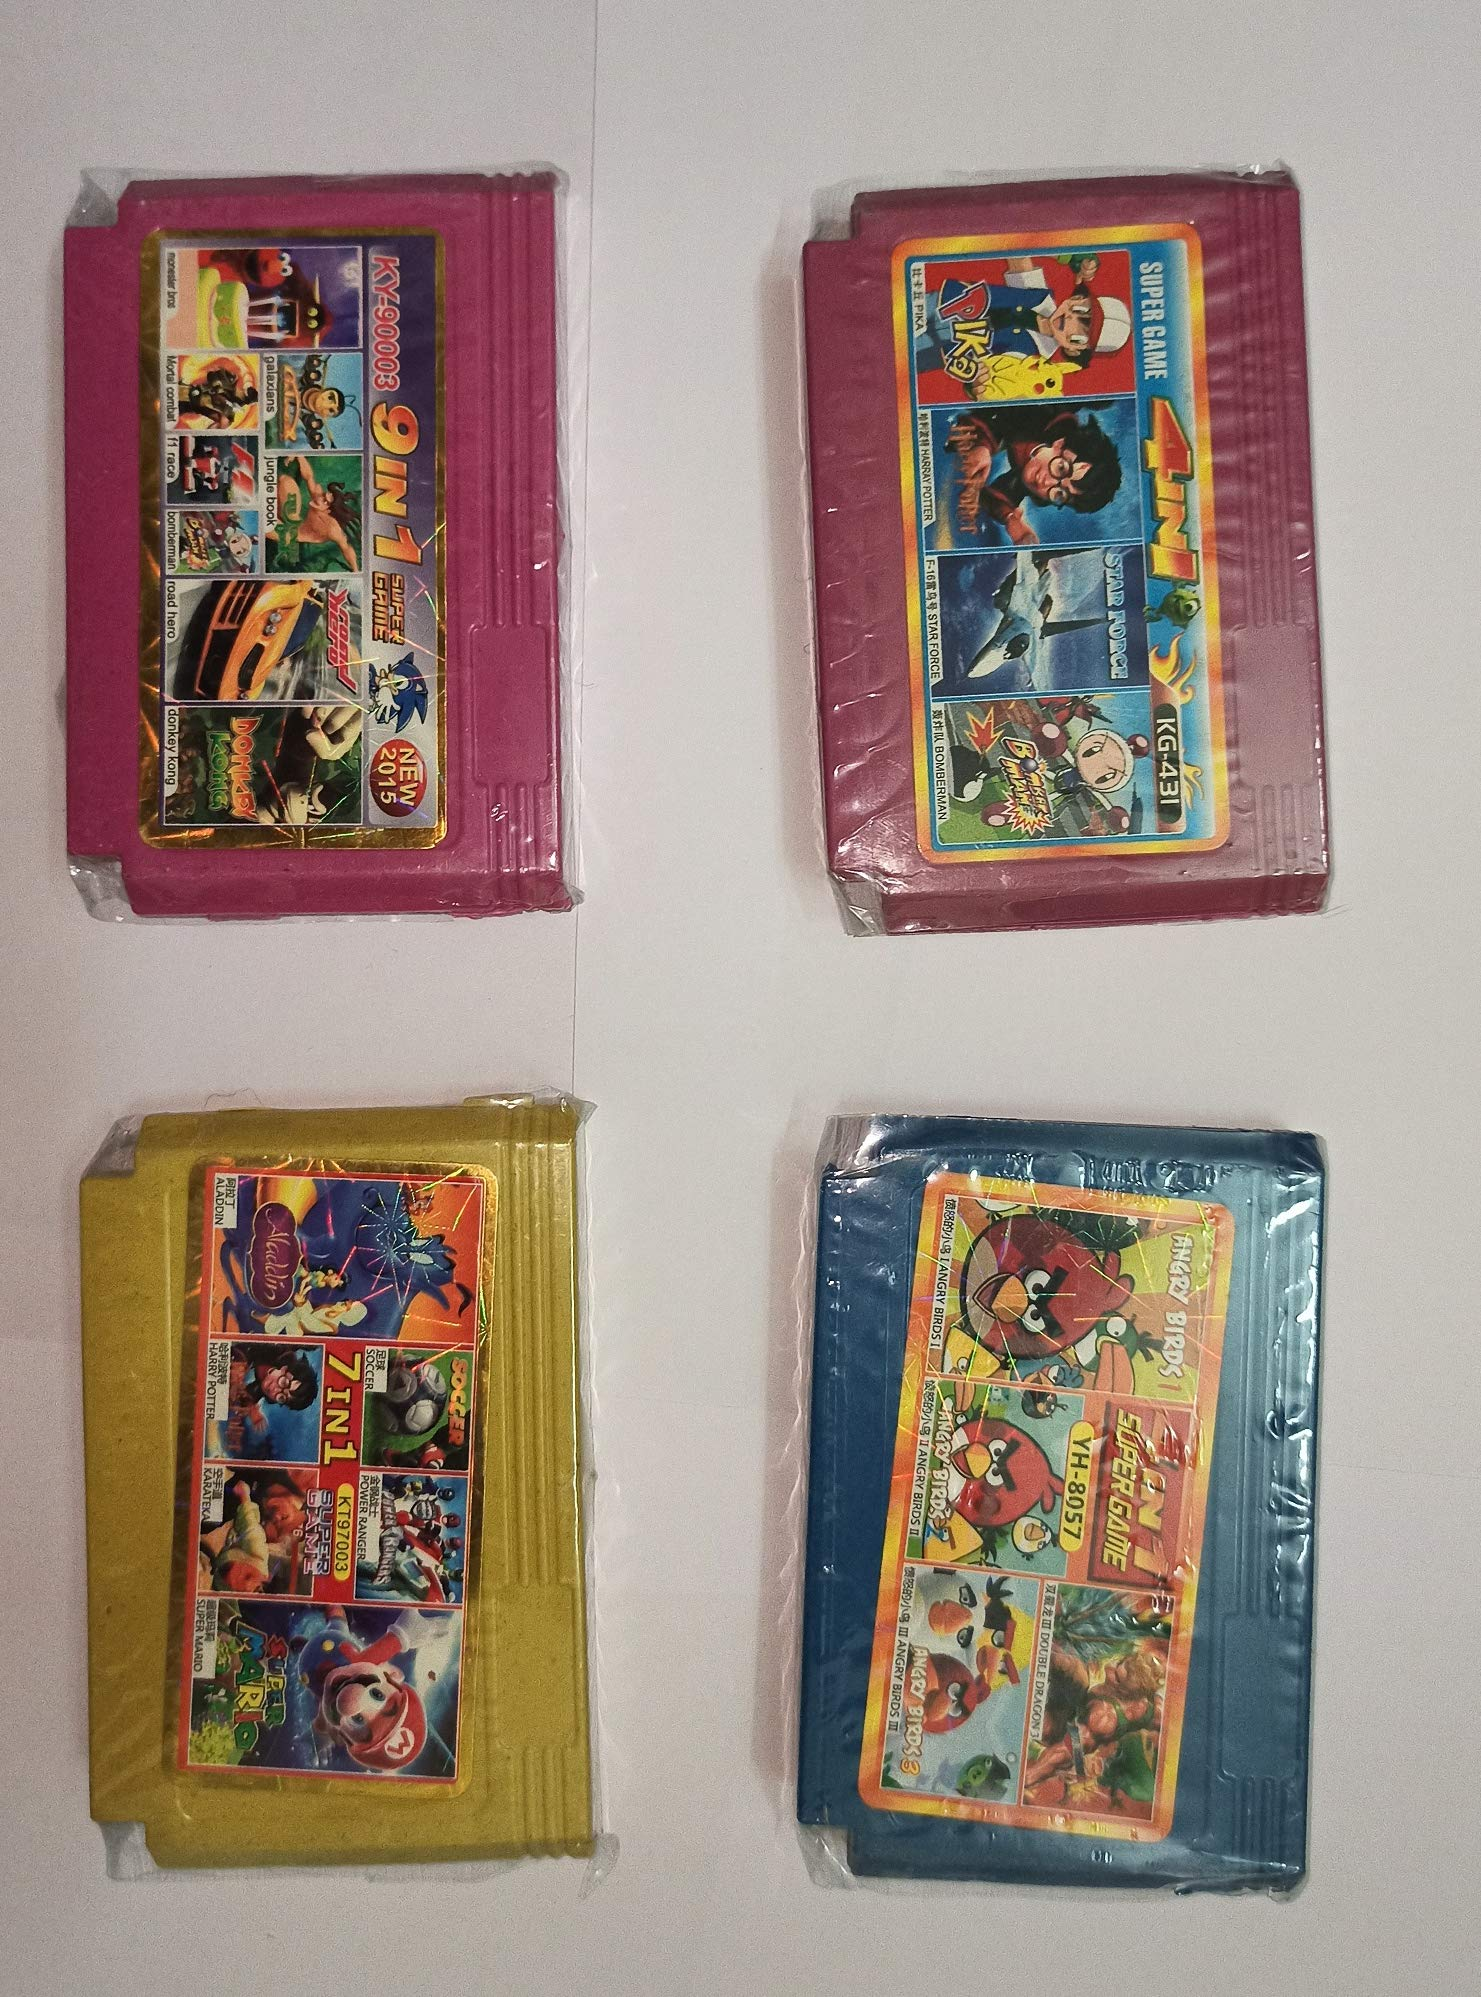 Crispy Deals Kid's 8 Bit Video Game Cassette (Multicolour)- Buy Online in  India at desertcart.in. ProductId : 72392530.